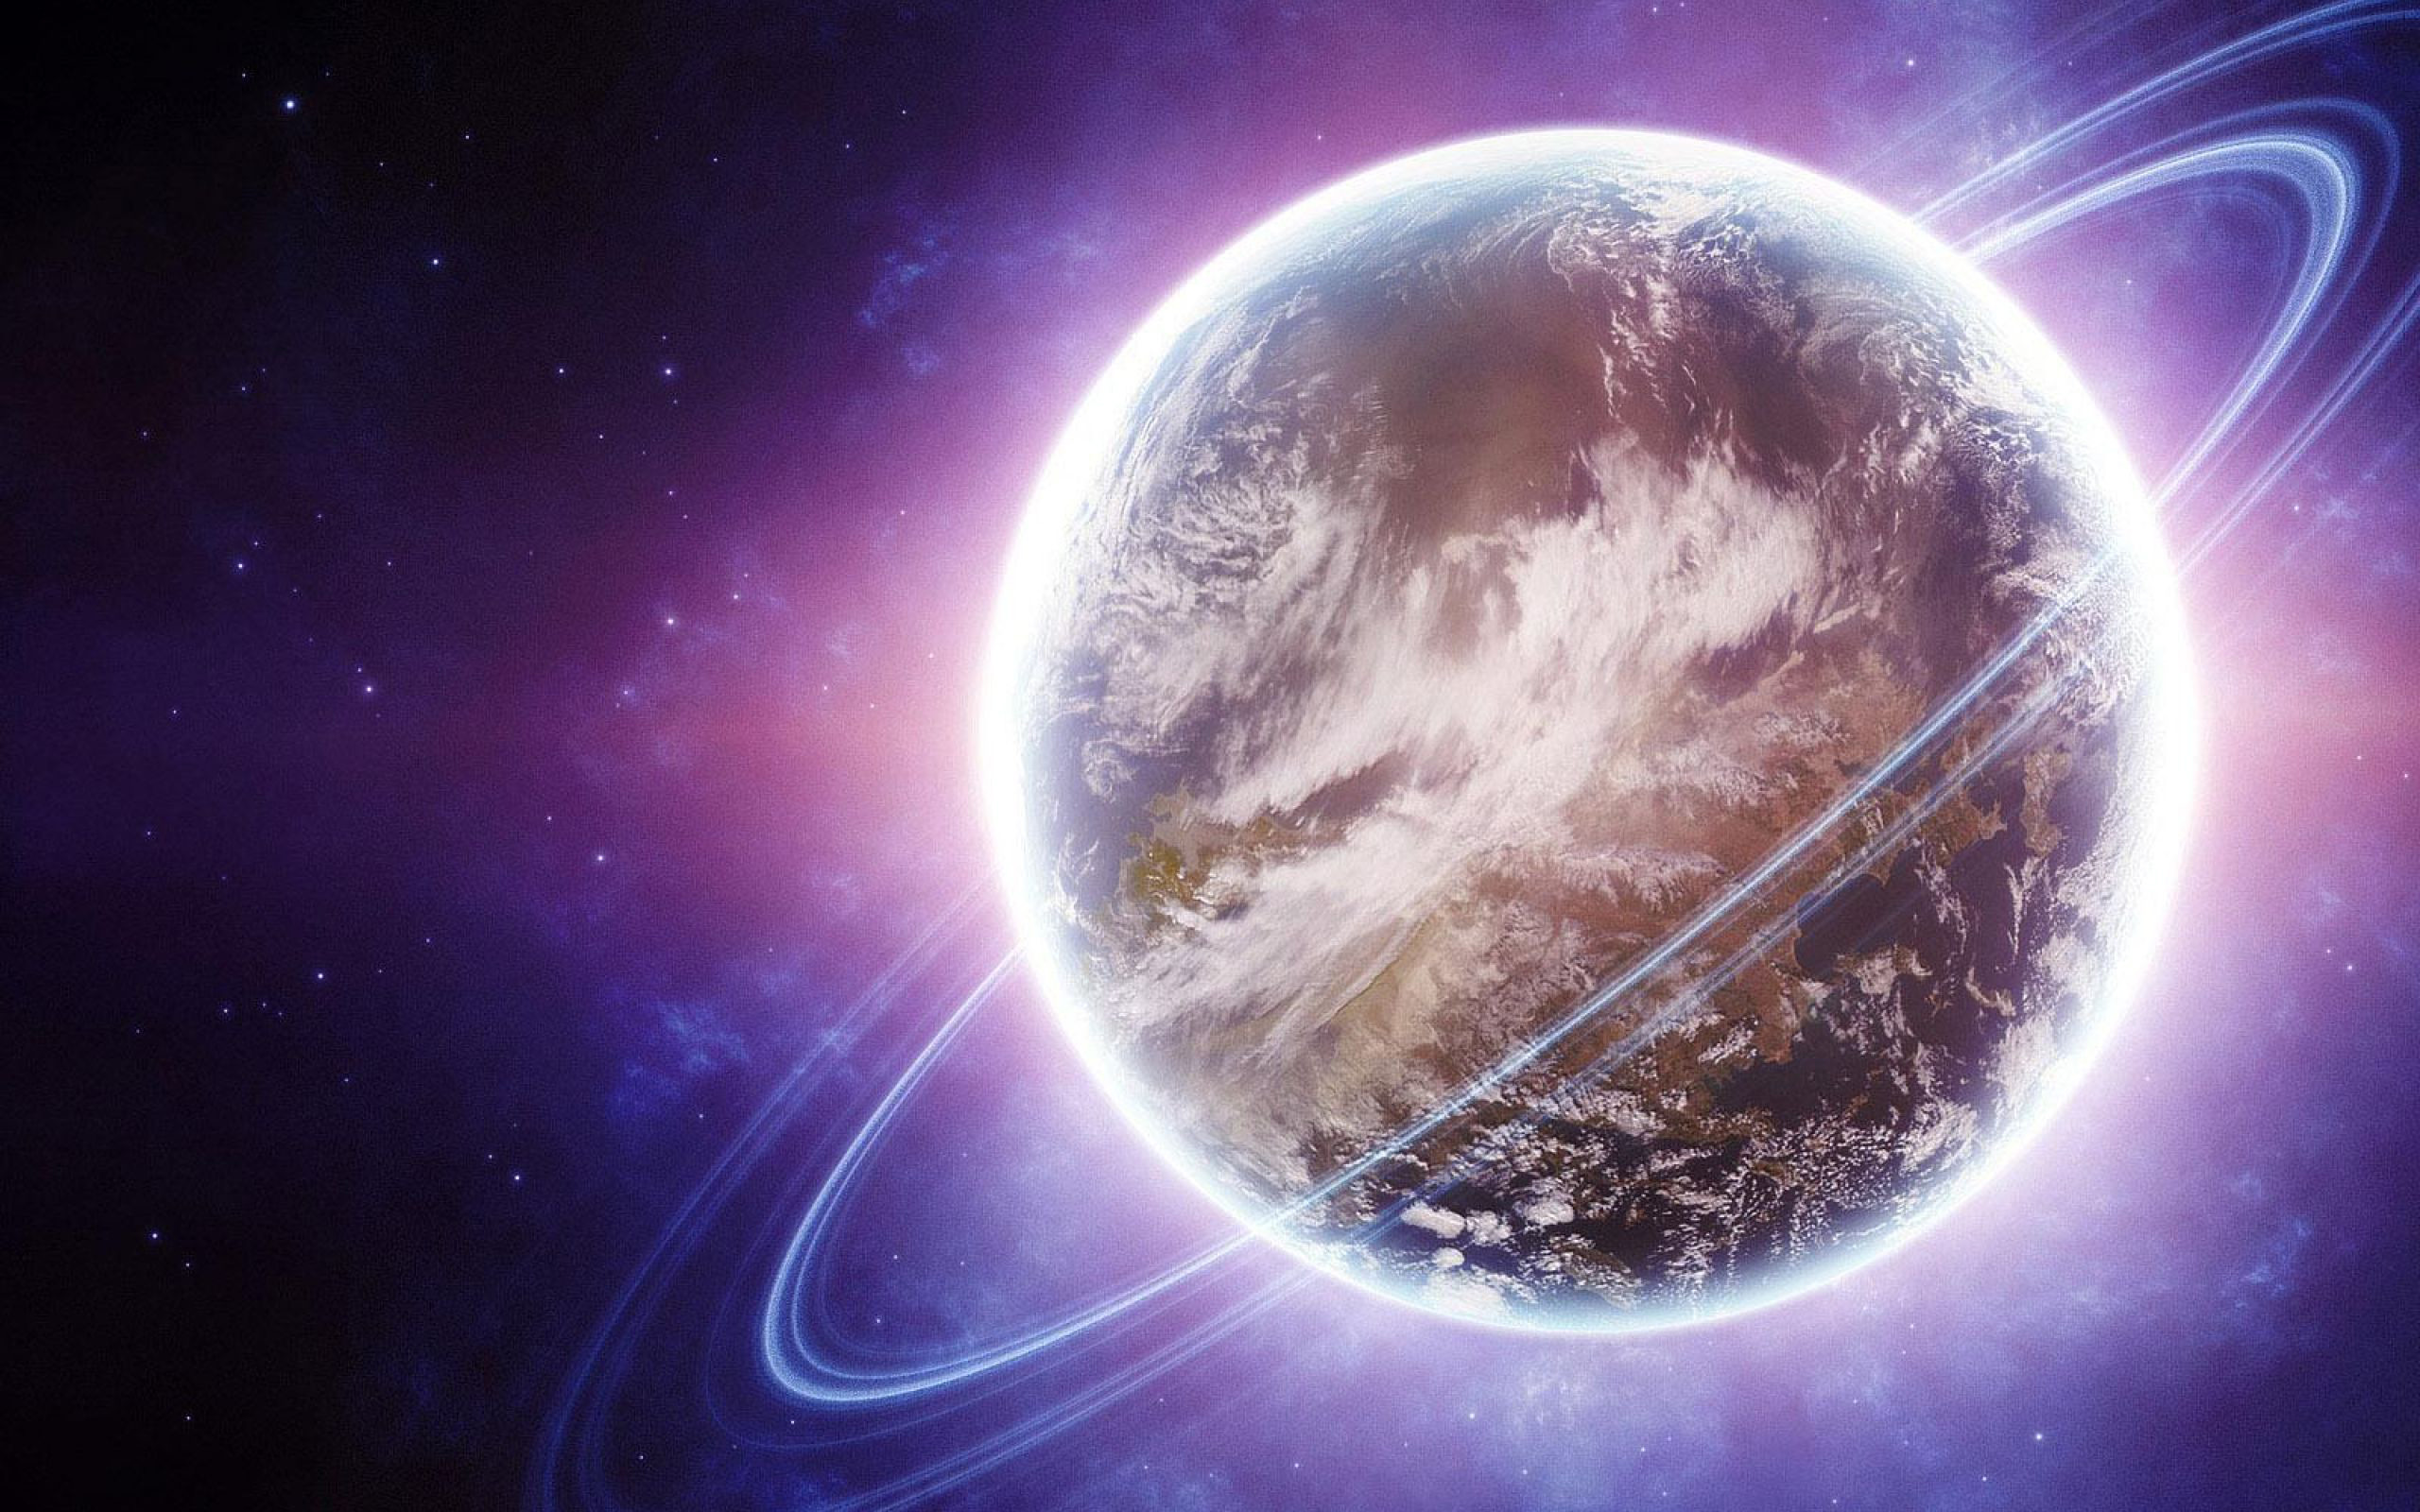 Solar System Backgrounds (63+ images)